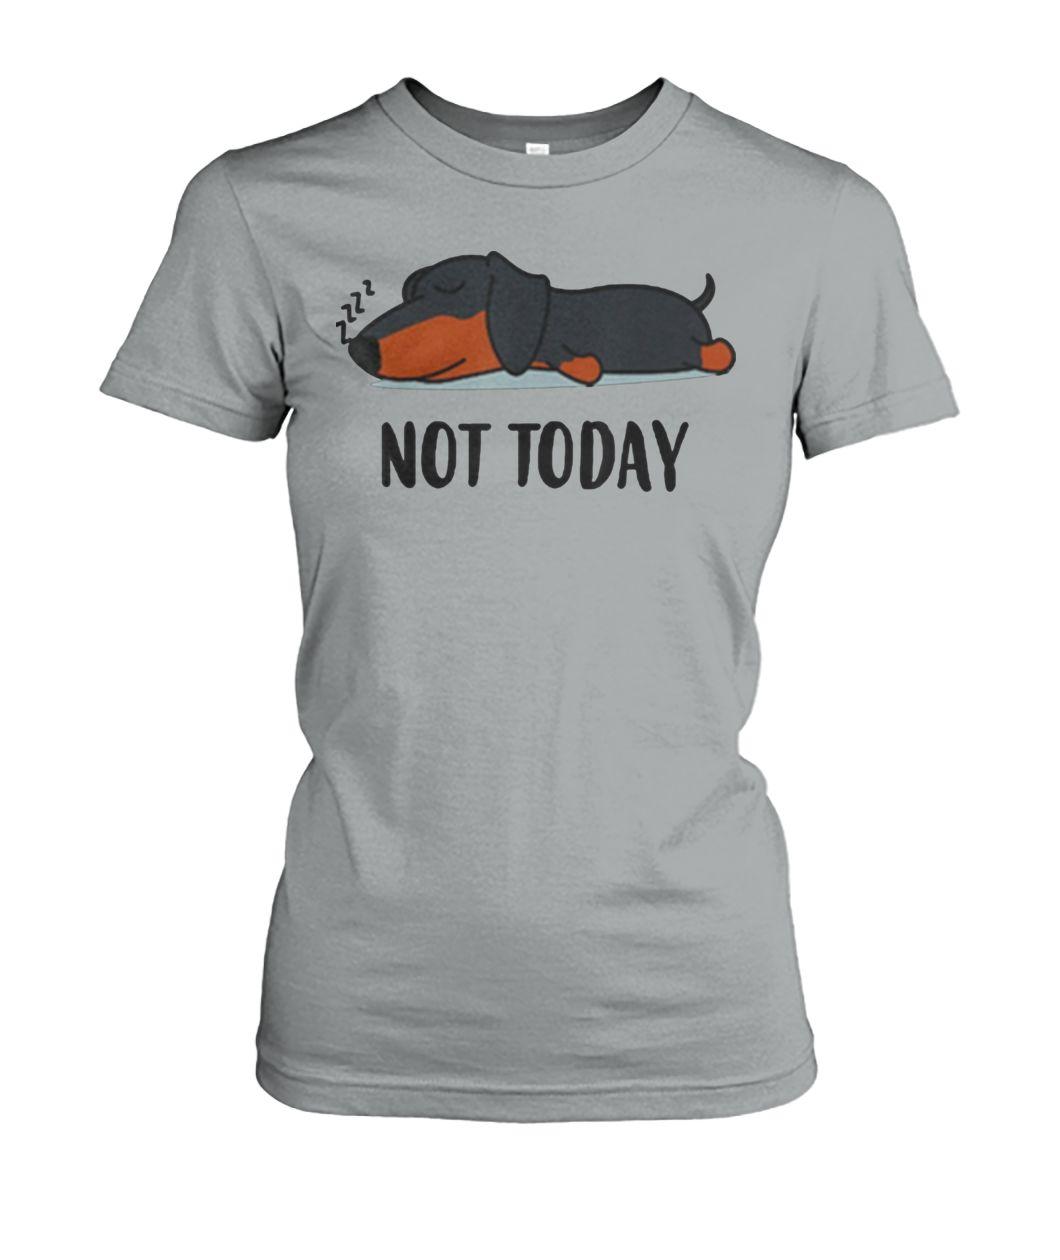 Badass version Dachshund not today shirt